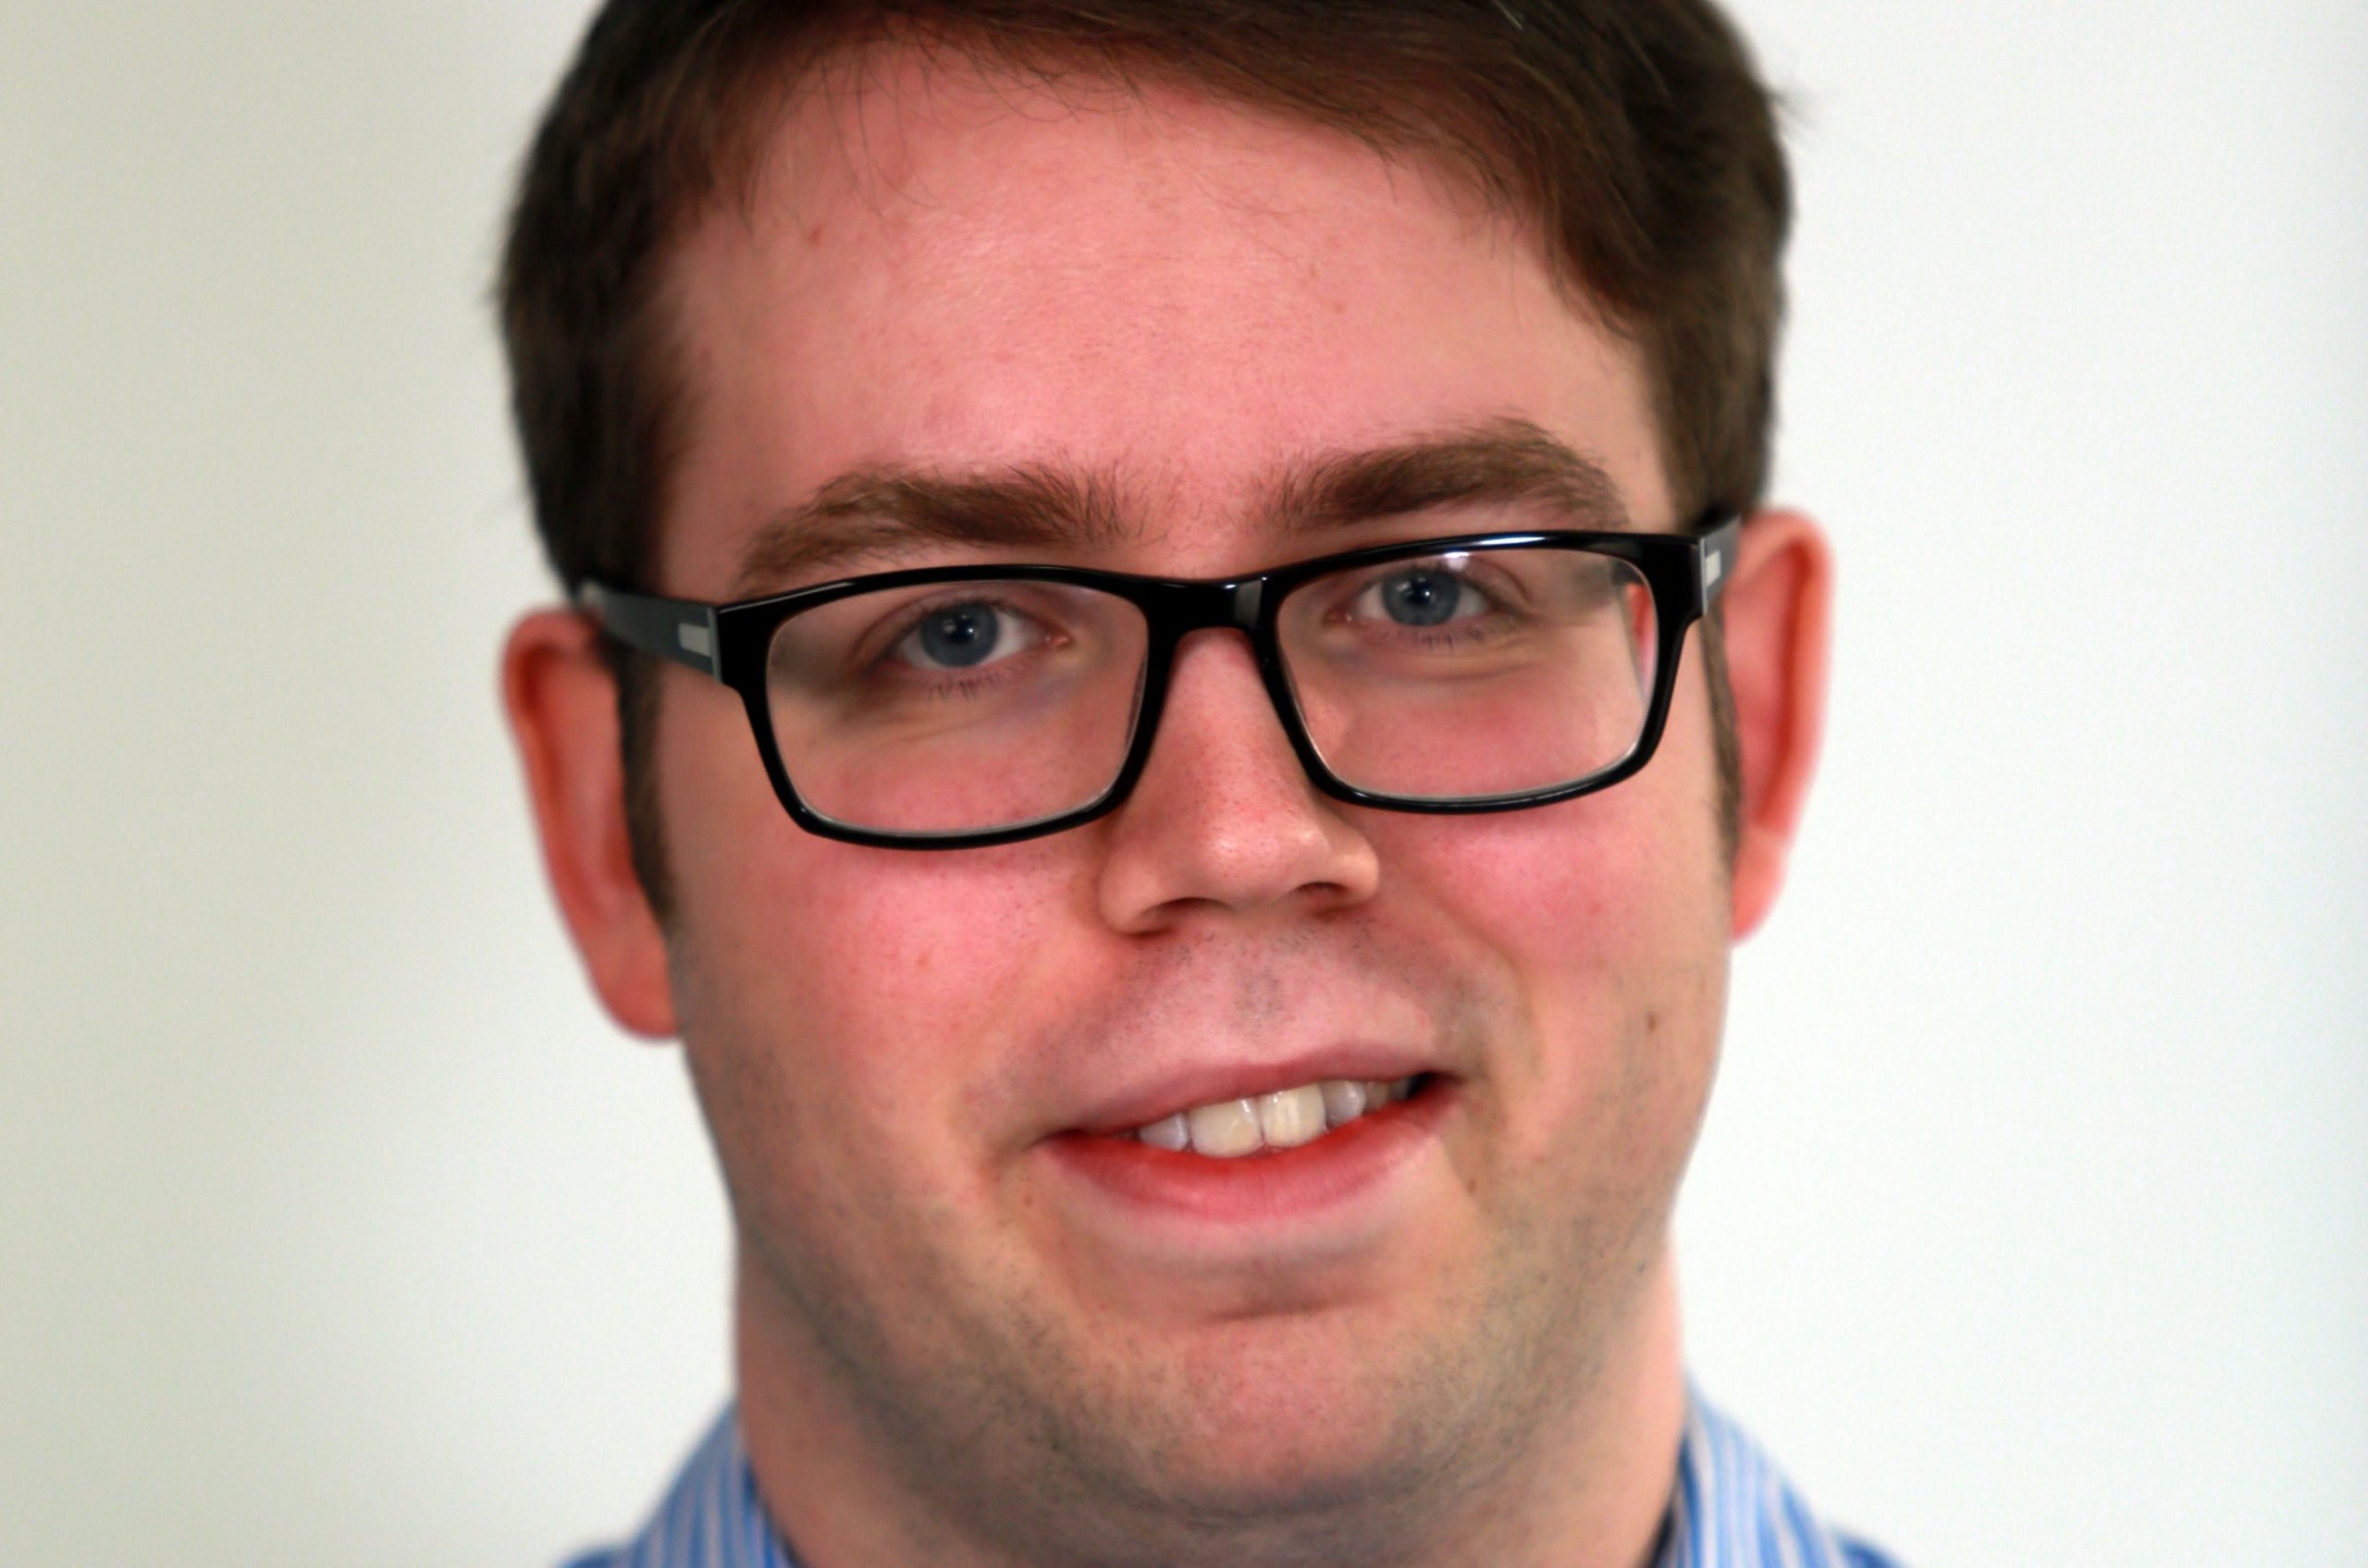 Channel 4 News appoints Jon Laurence as Digital Editor